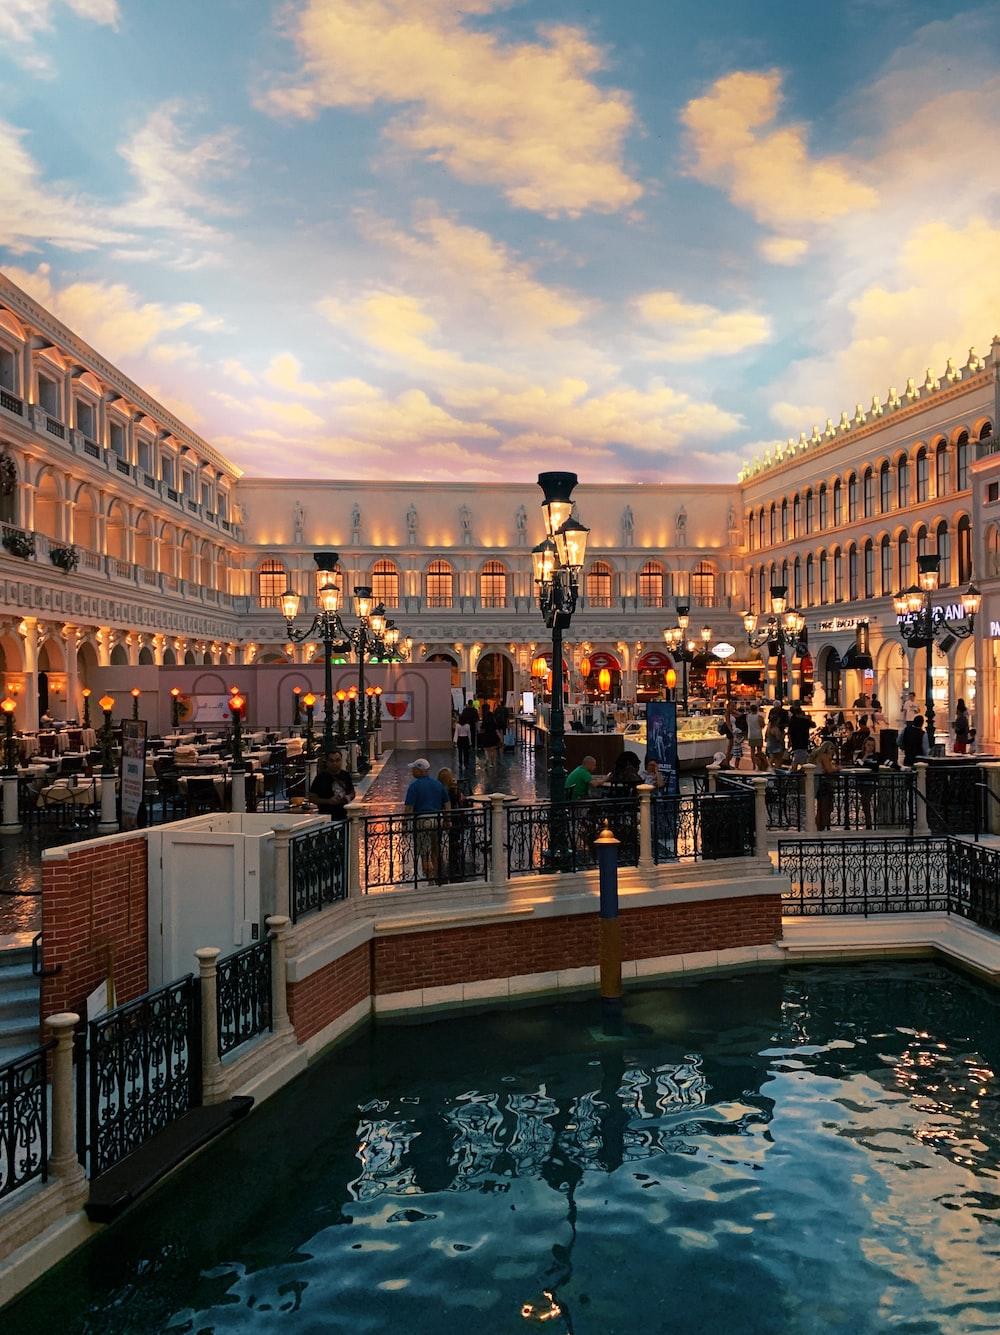 people near railings inside Venetian Macau